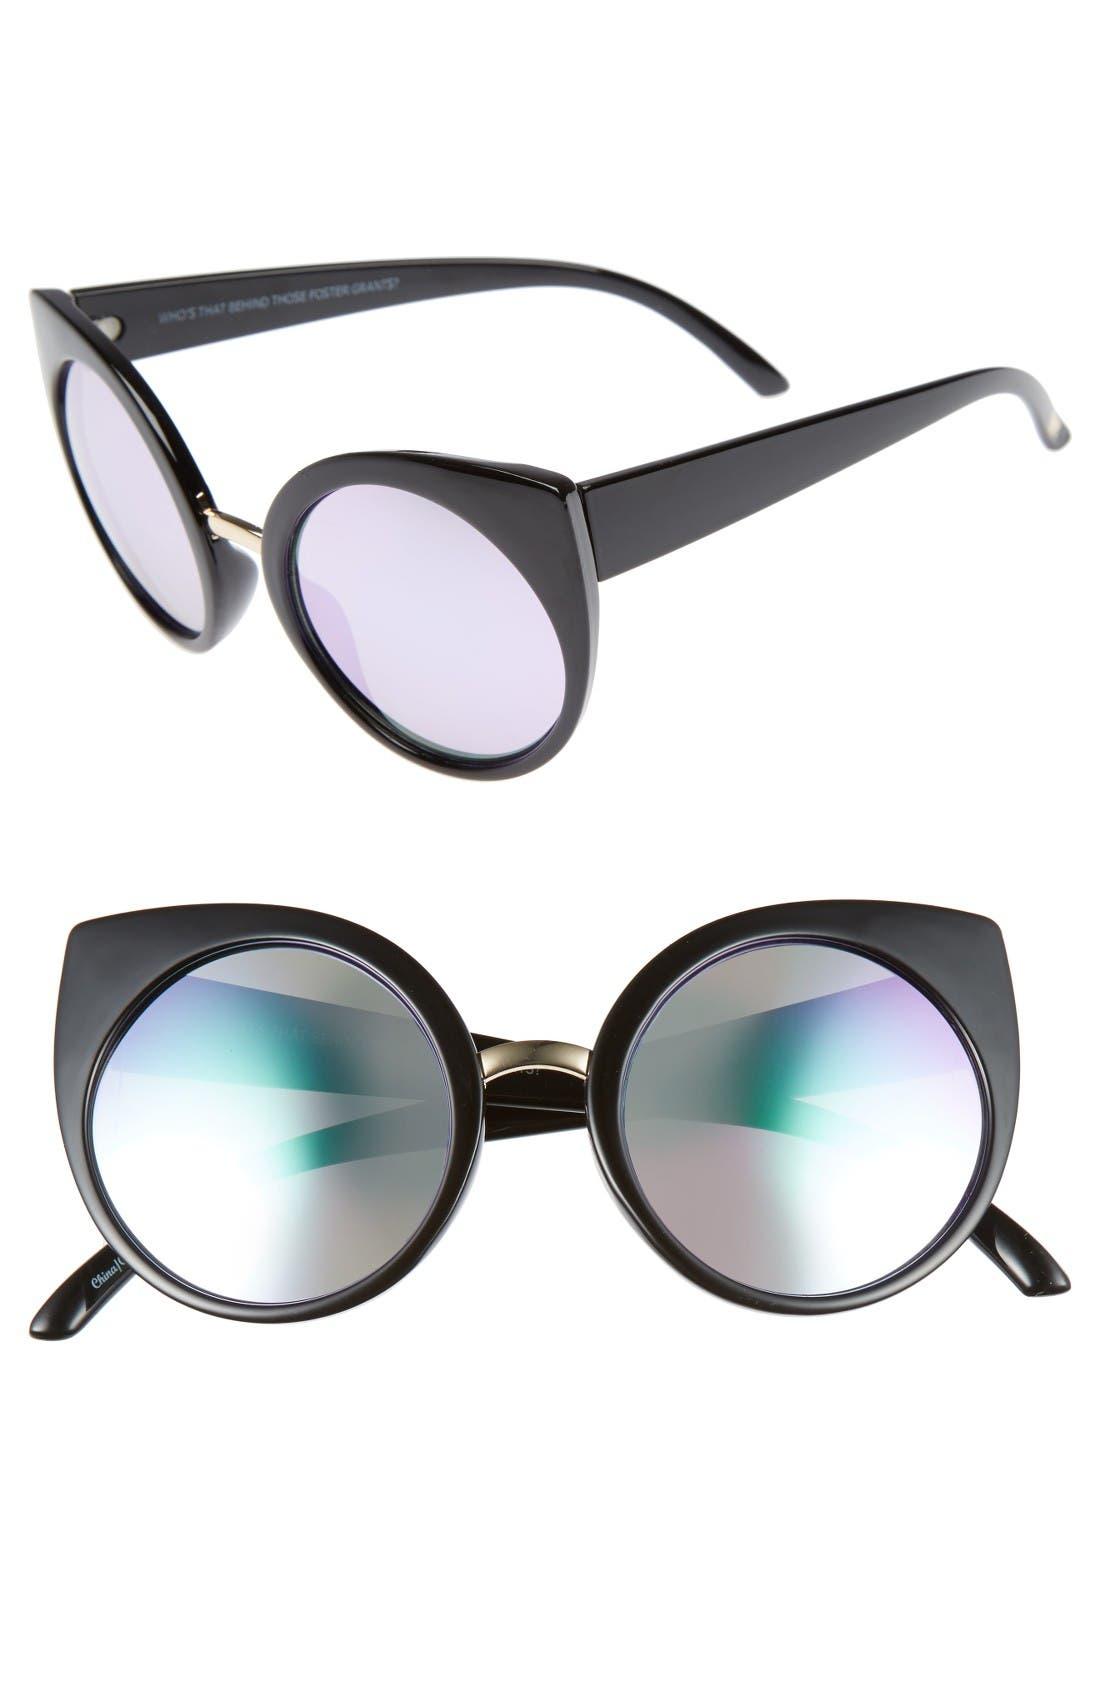 ITEM 8 MG.5 52mm Cat Eye Sunglasses